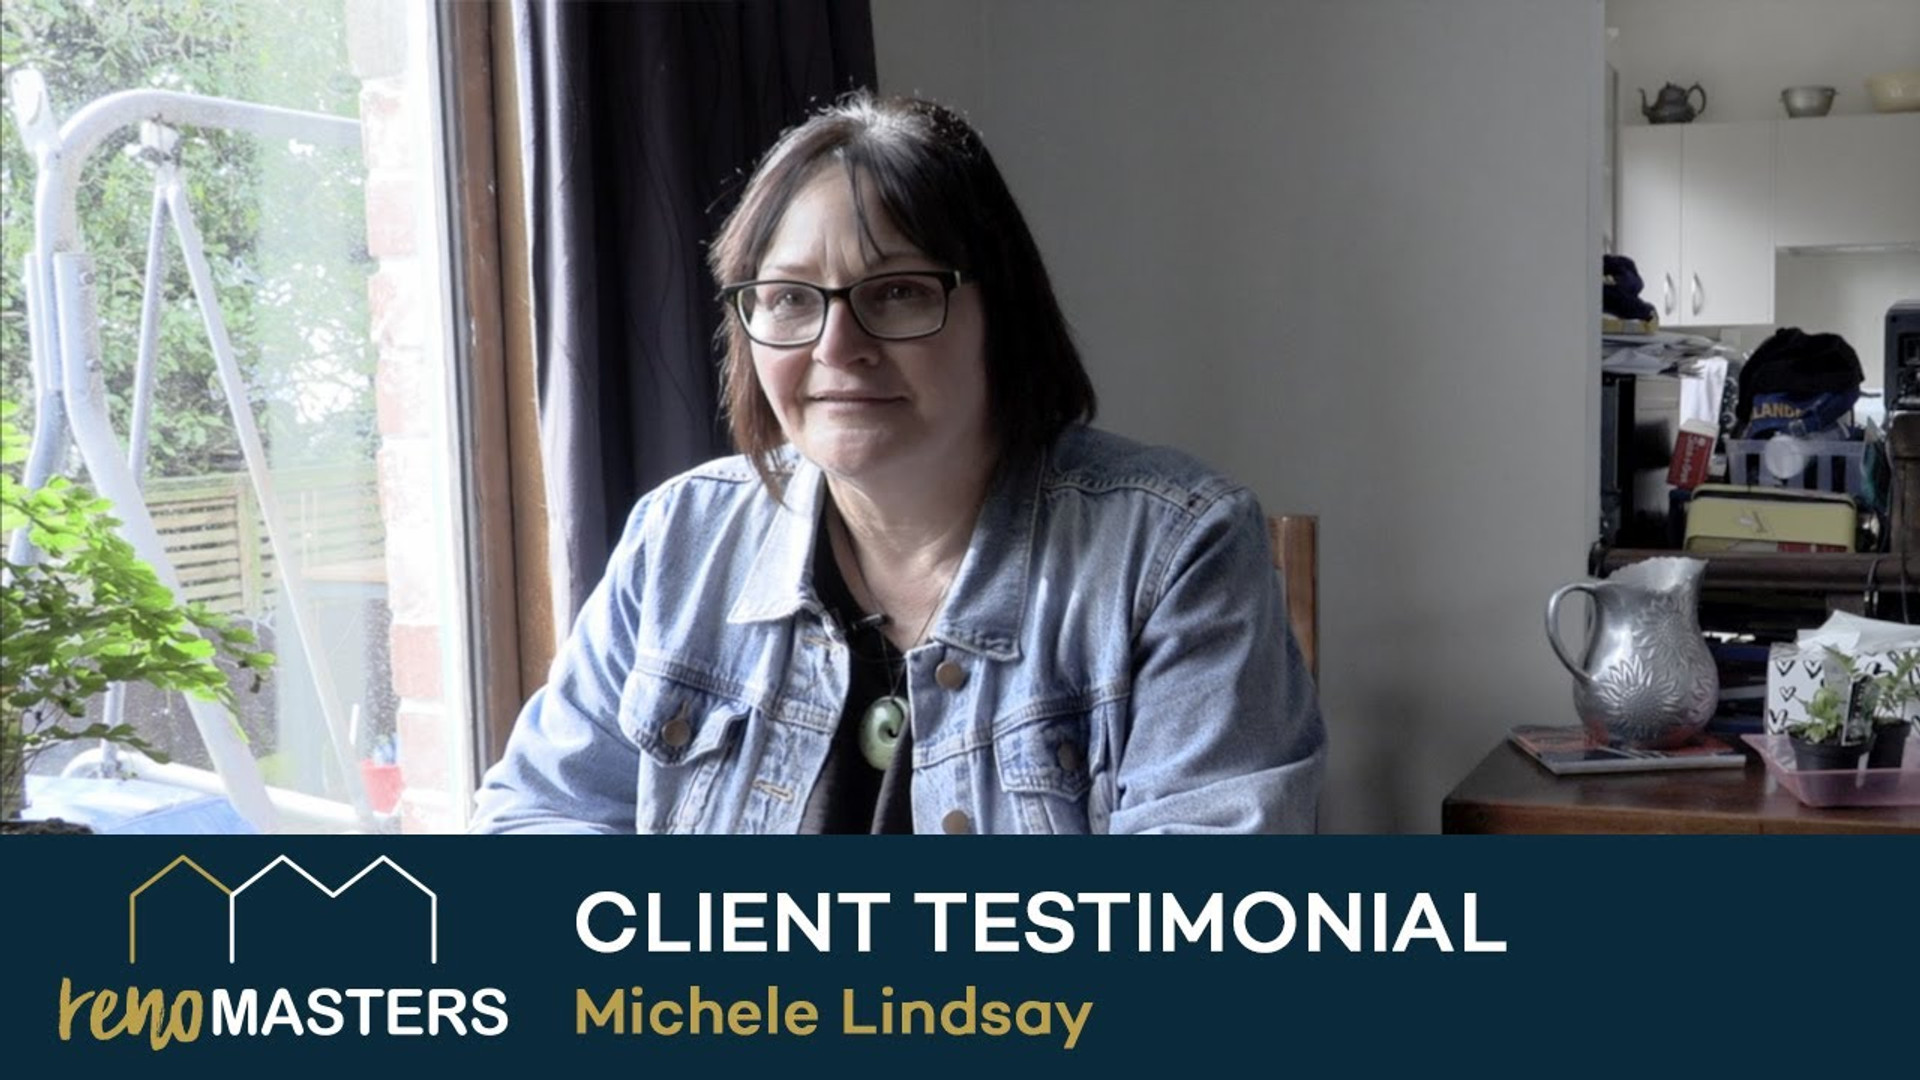 Michele Lindsay